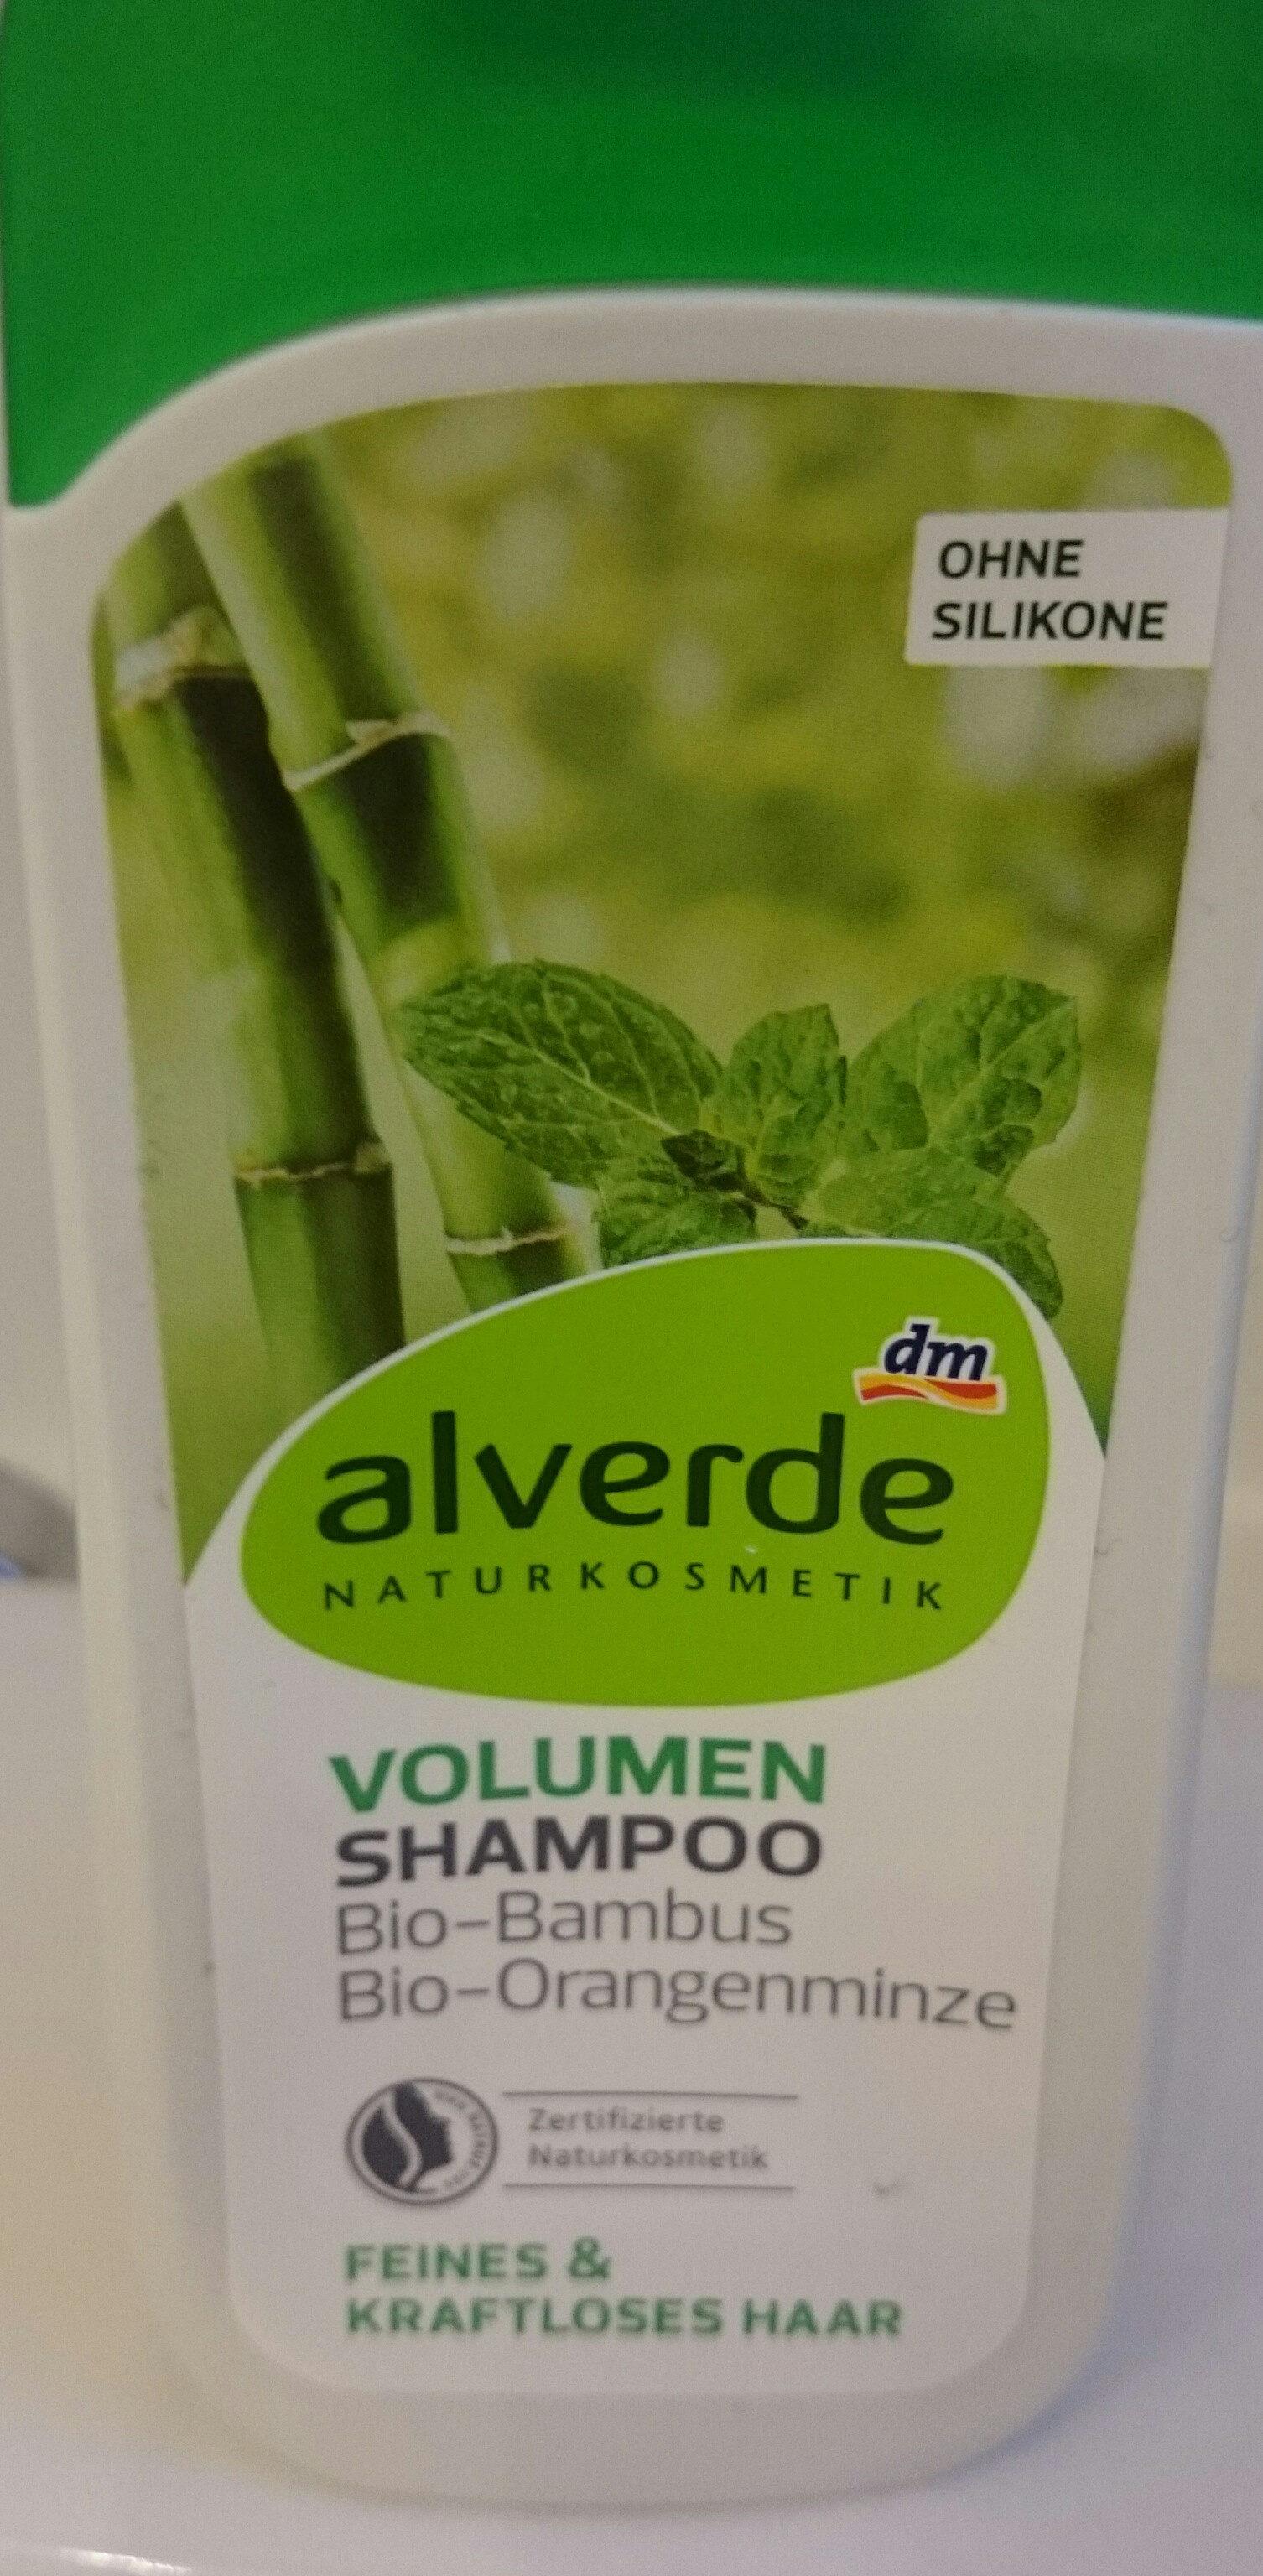 Volumen-Shampoo - Product - de